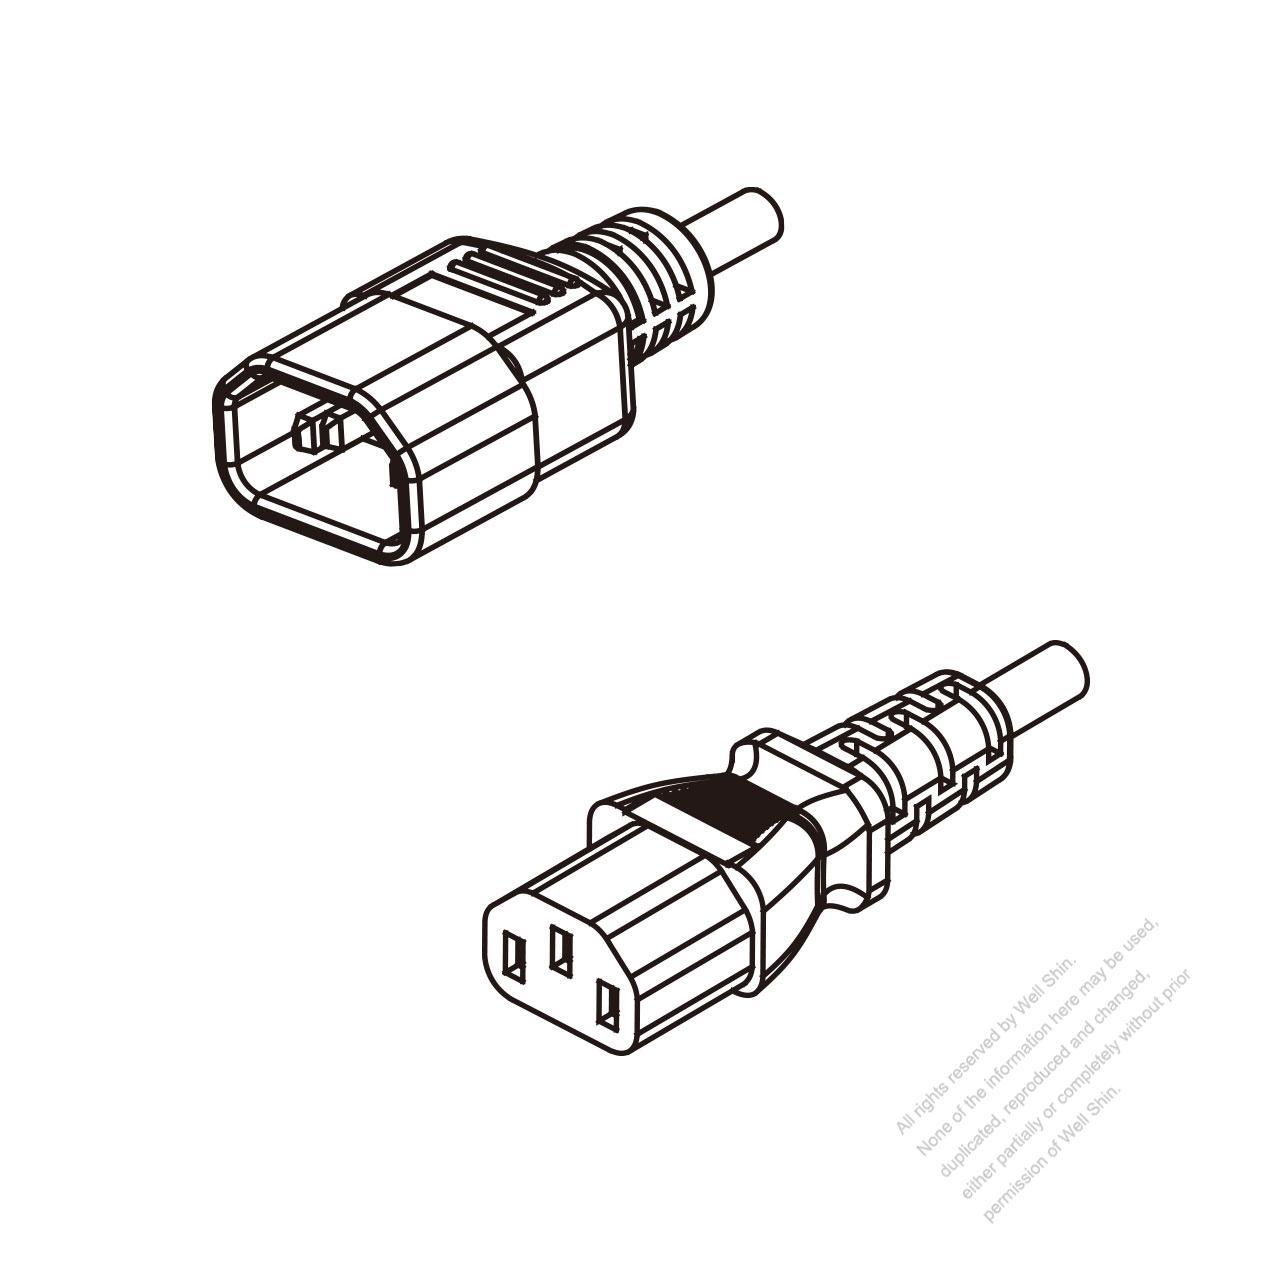 Australia 3 Pin Iec 320 Sheet E Plug To C13 Ac Power Cord Wiring